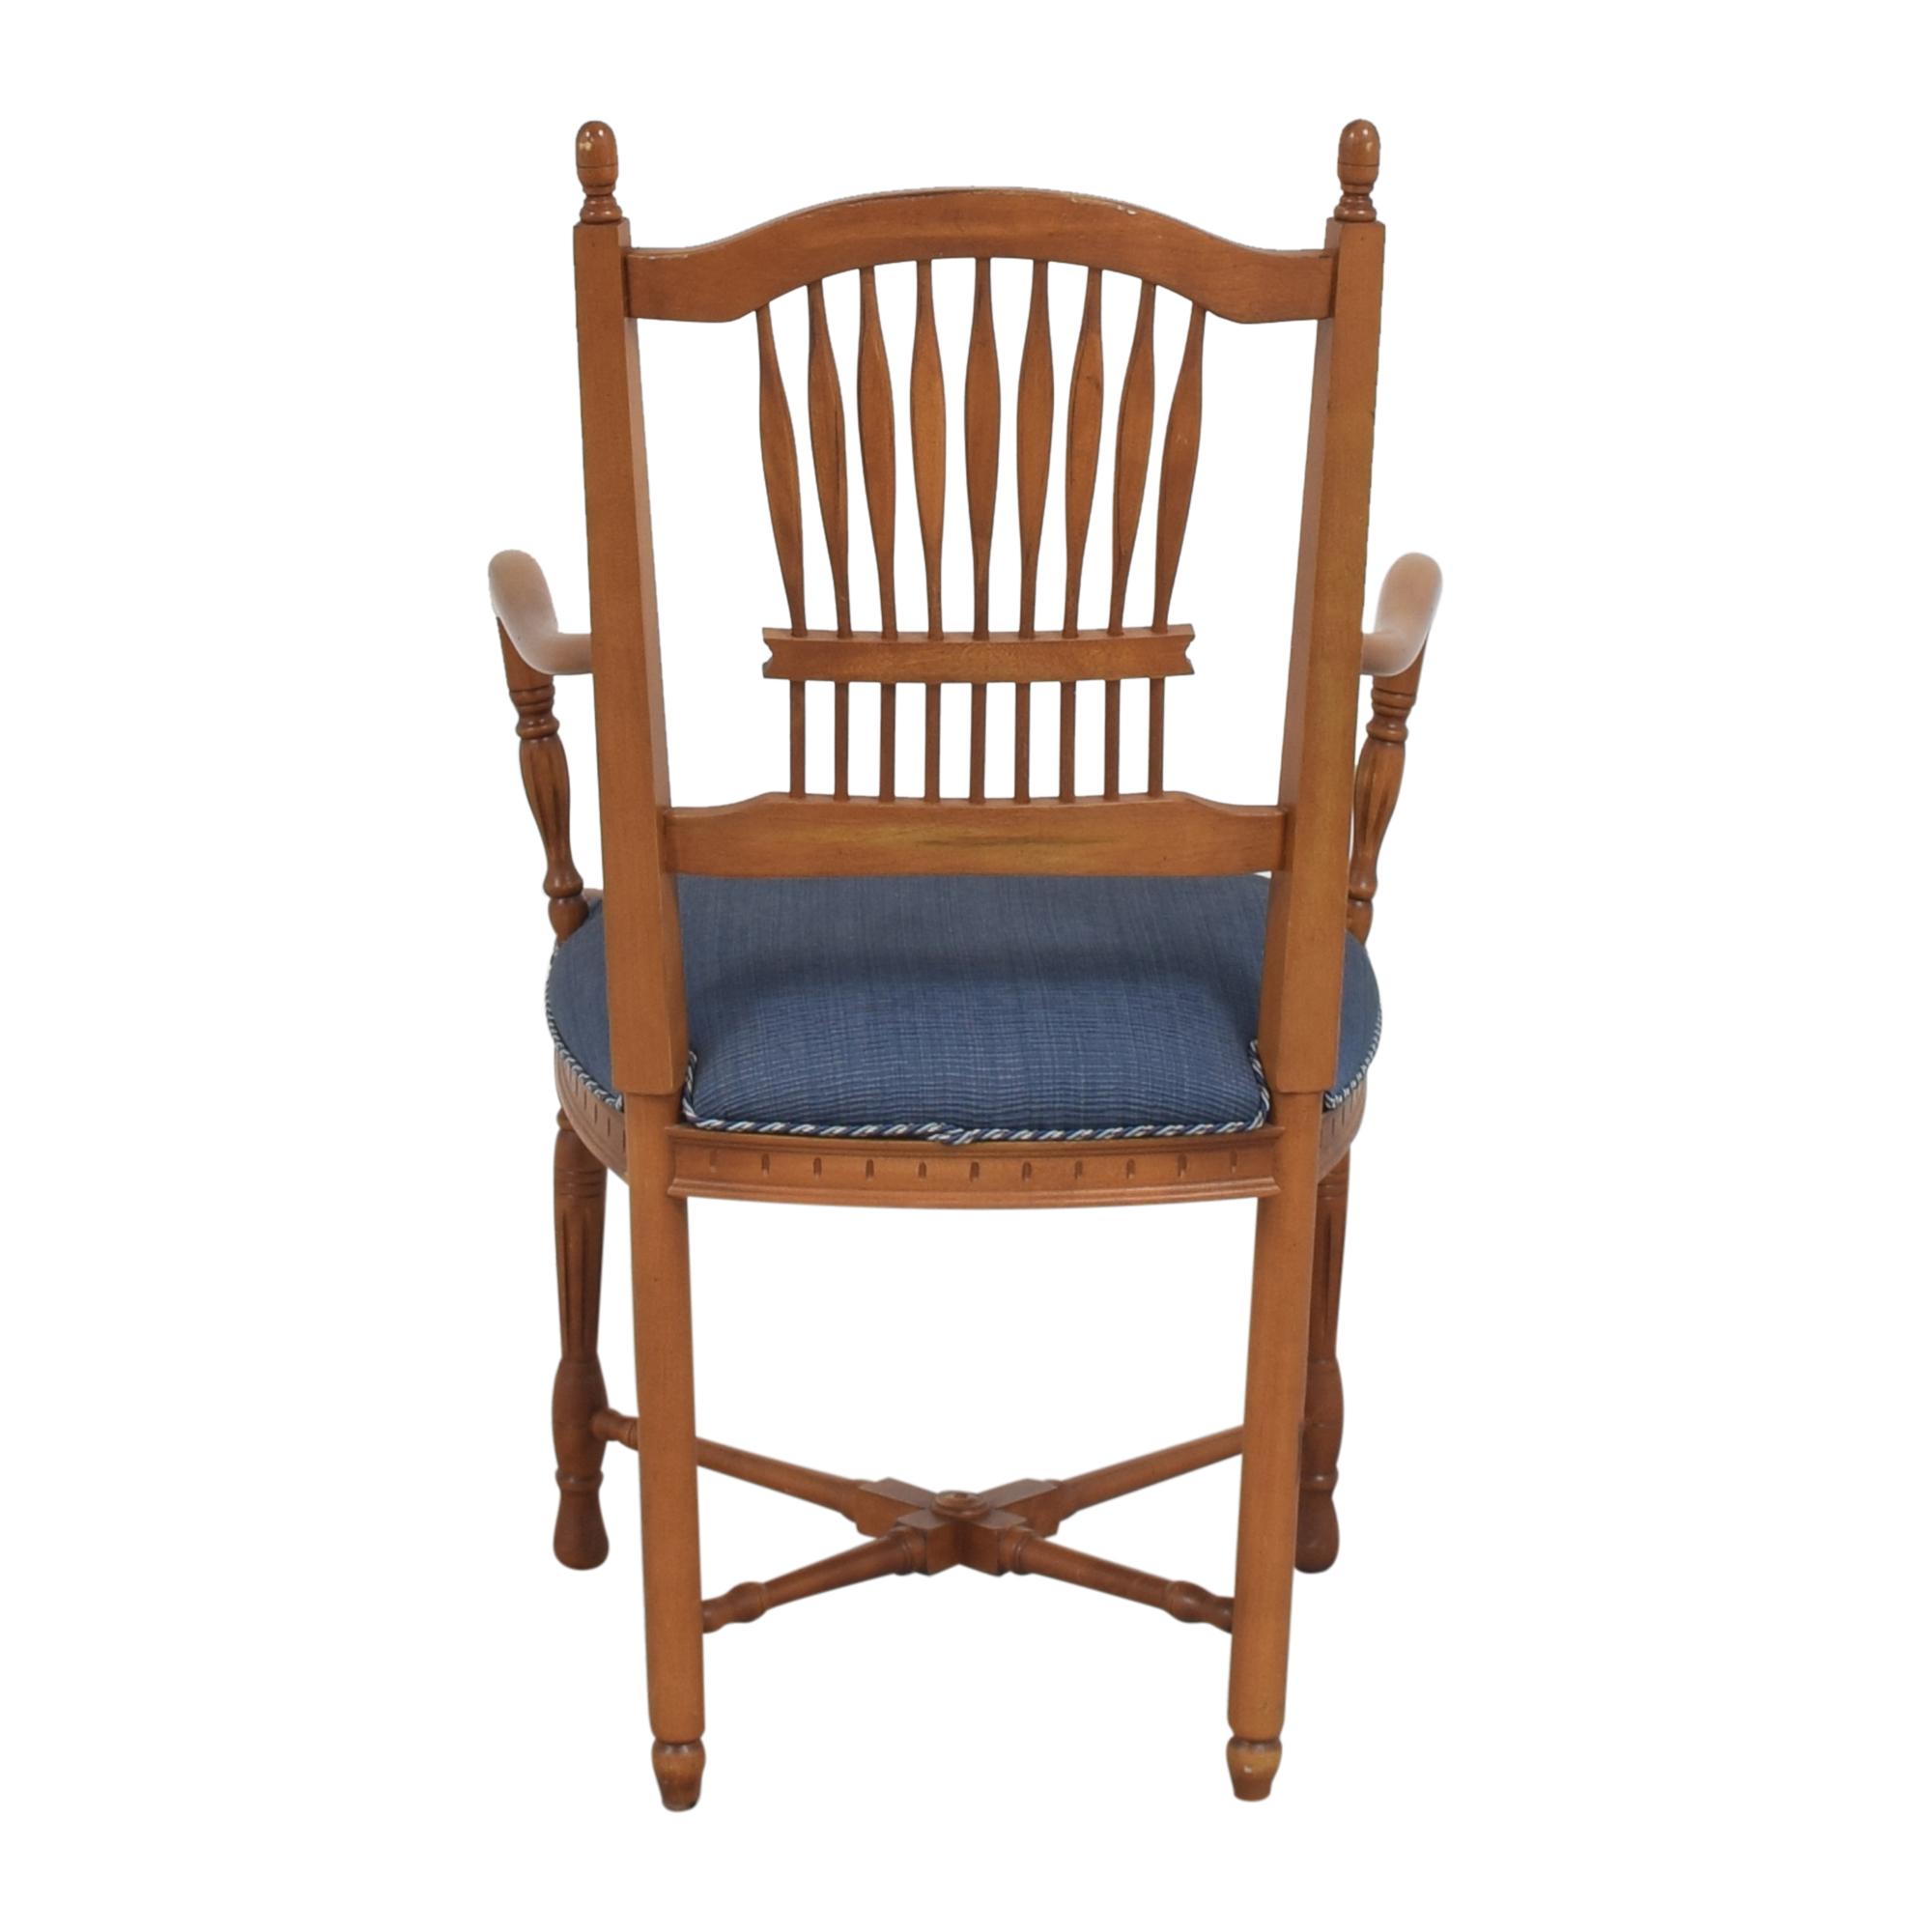 Ethan Allen Ethan Allen Wheatback Chair on sale